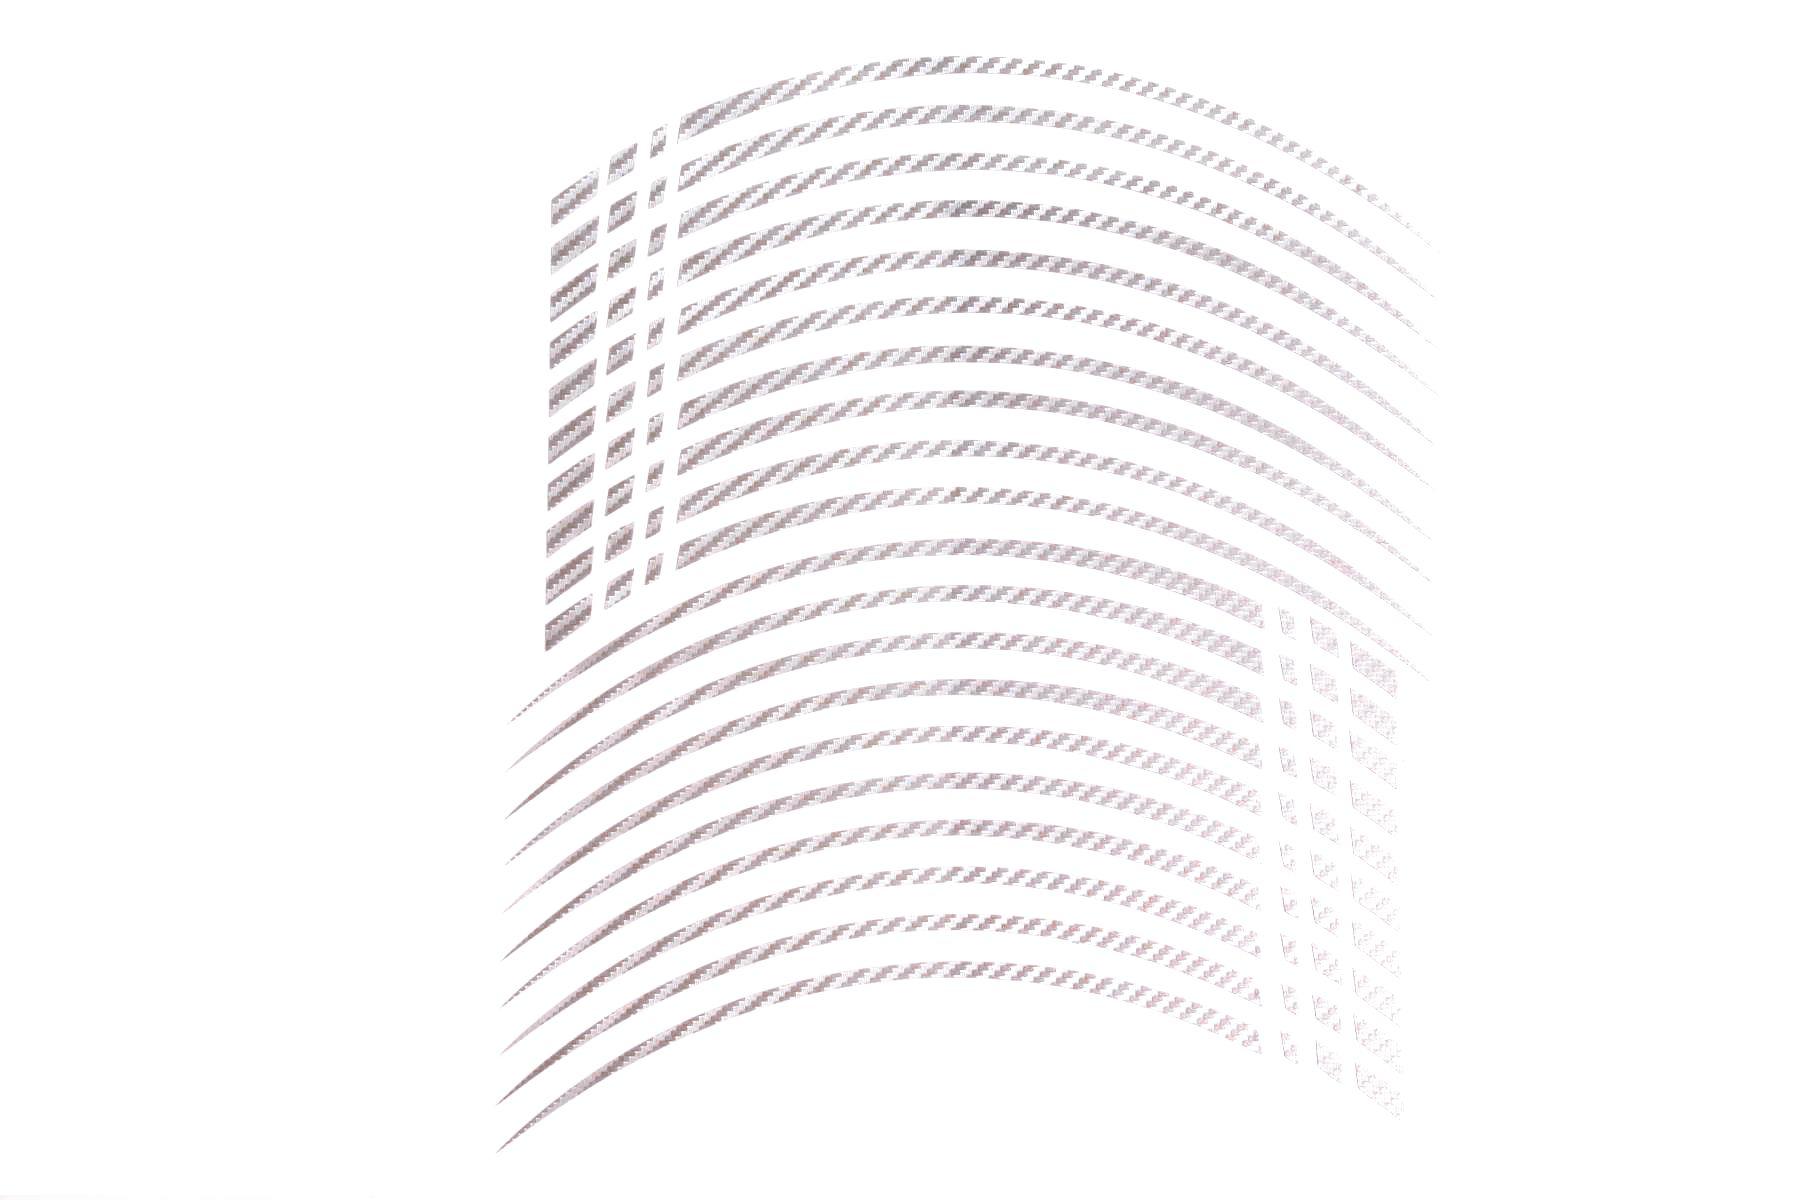 Gp2 20 Felgenaufkleber In Der Farbe Carbon Silber